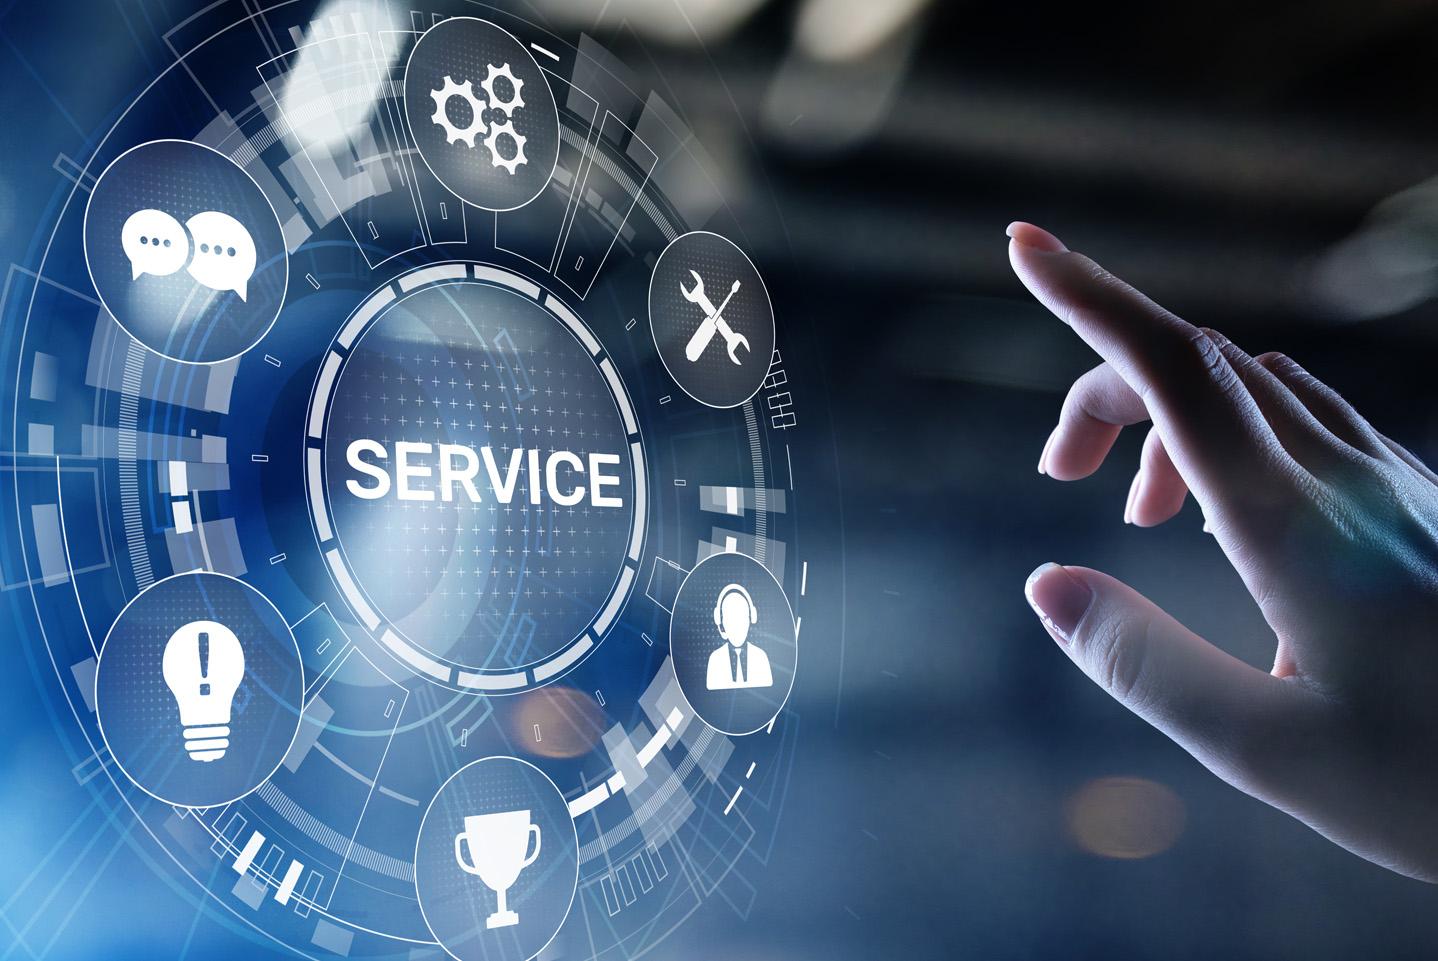 apsec Managed Service